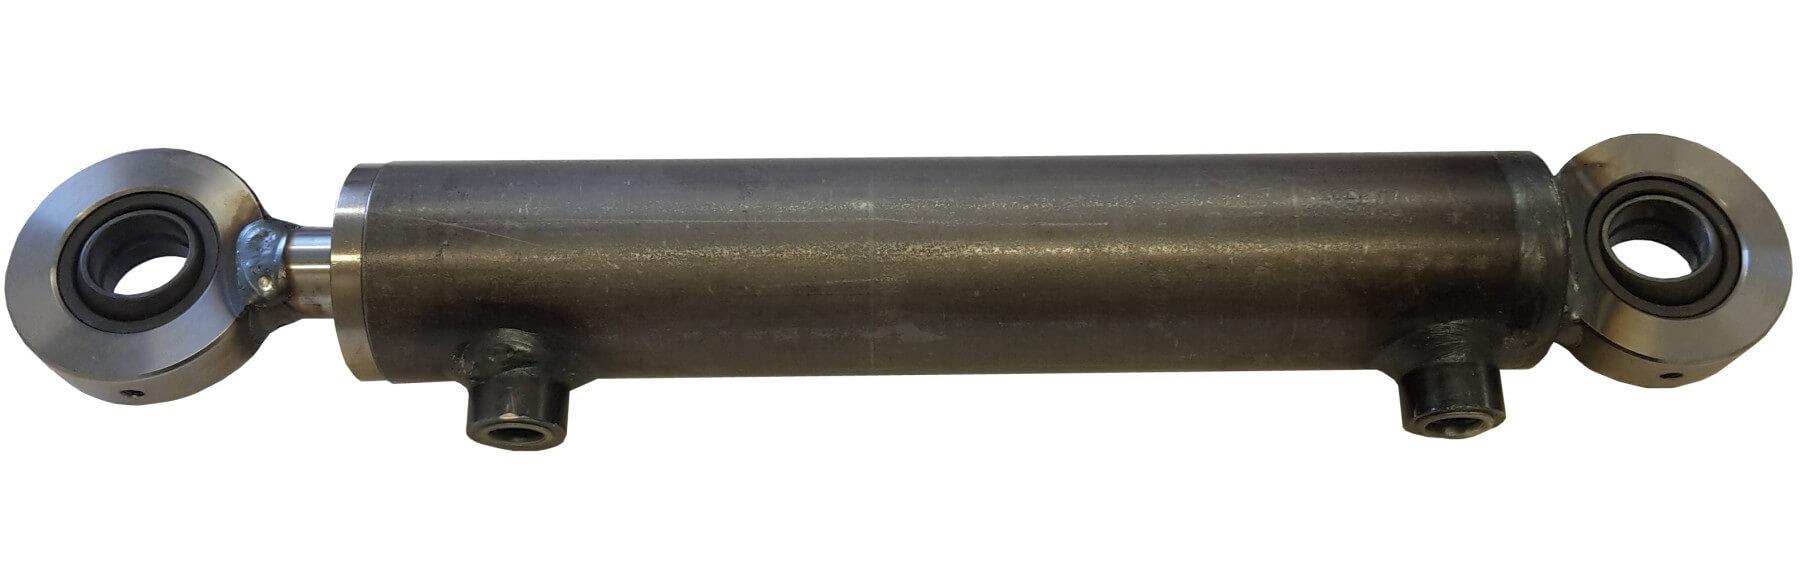 Hydraulisylinteri CL 60. 30. 300 GE